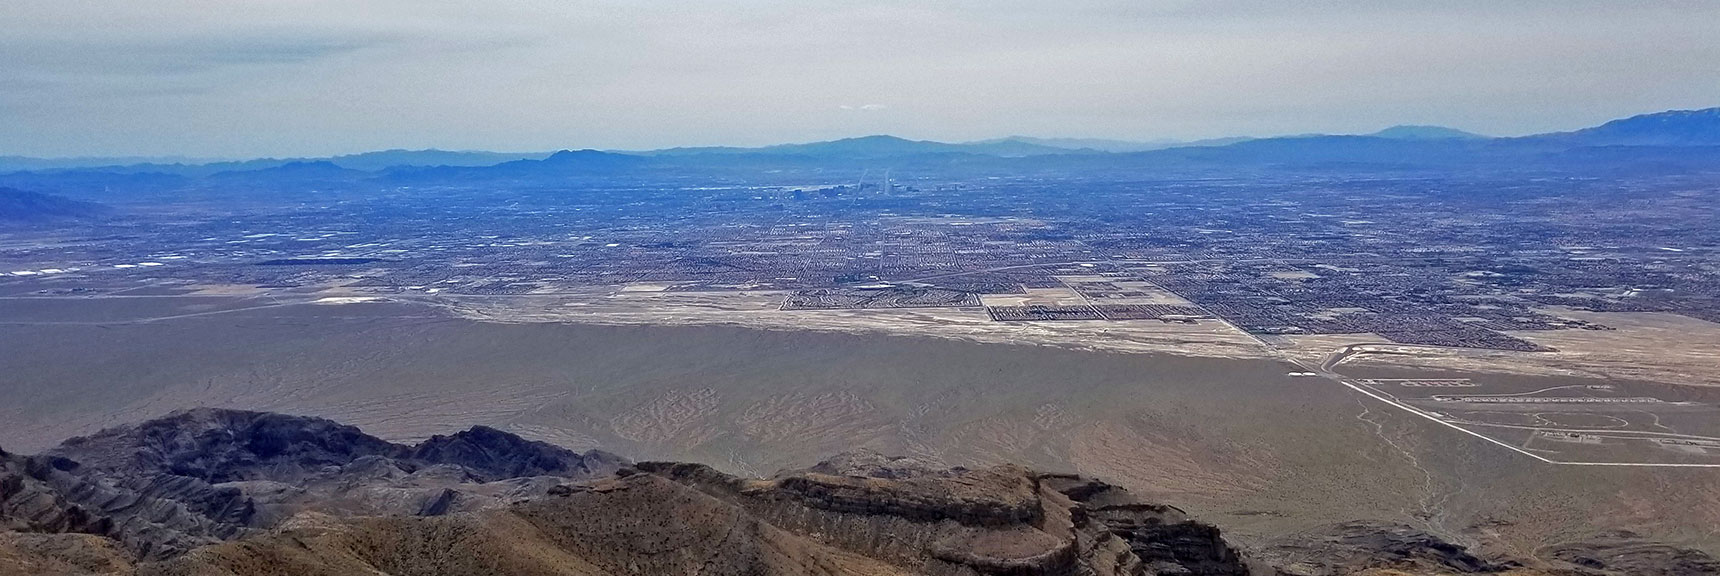 View of Northeastern Las Vegas from Near the Eastern Summit of Gass Peak | Gass Peak Eastern Summit Ultra-marathon Adventure, Nevada